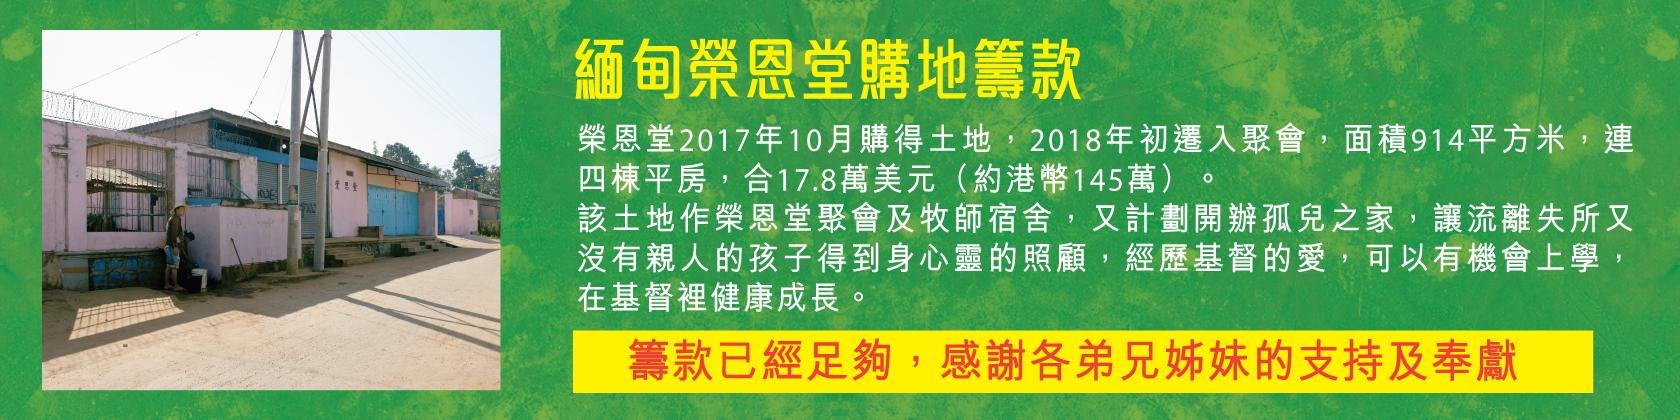 CB-02-web-banner-1680-x-420-05-2